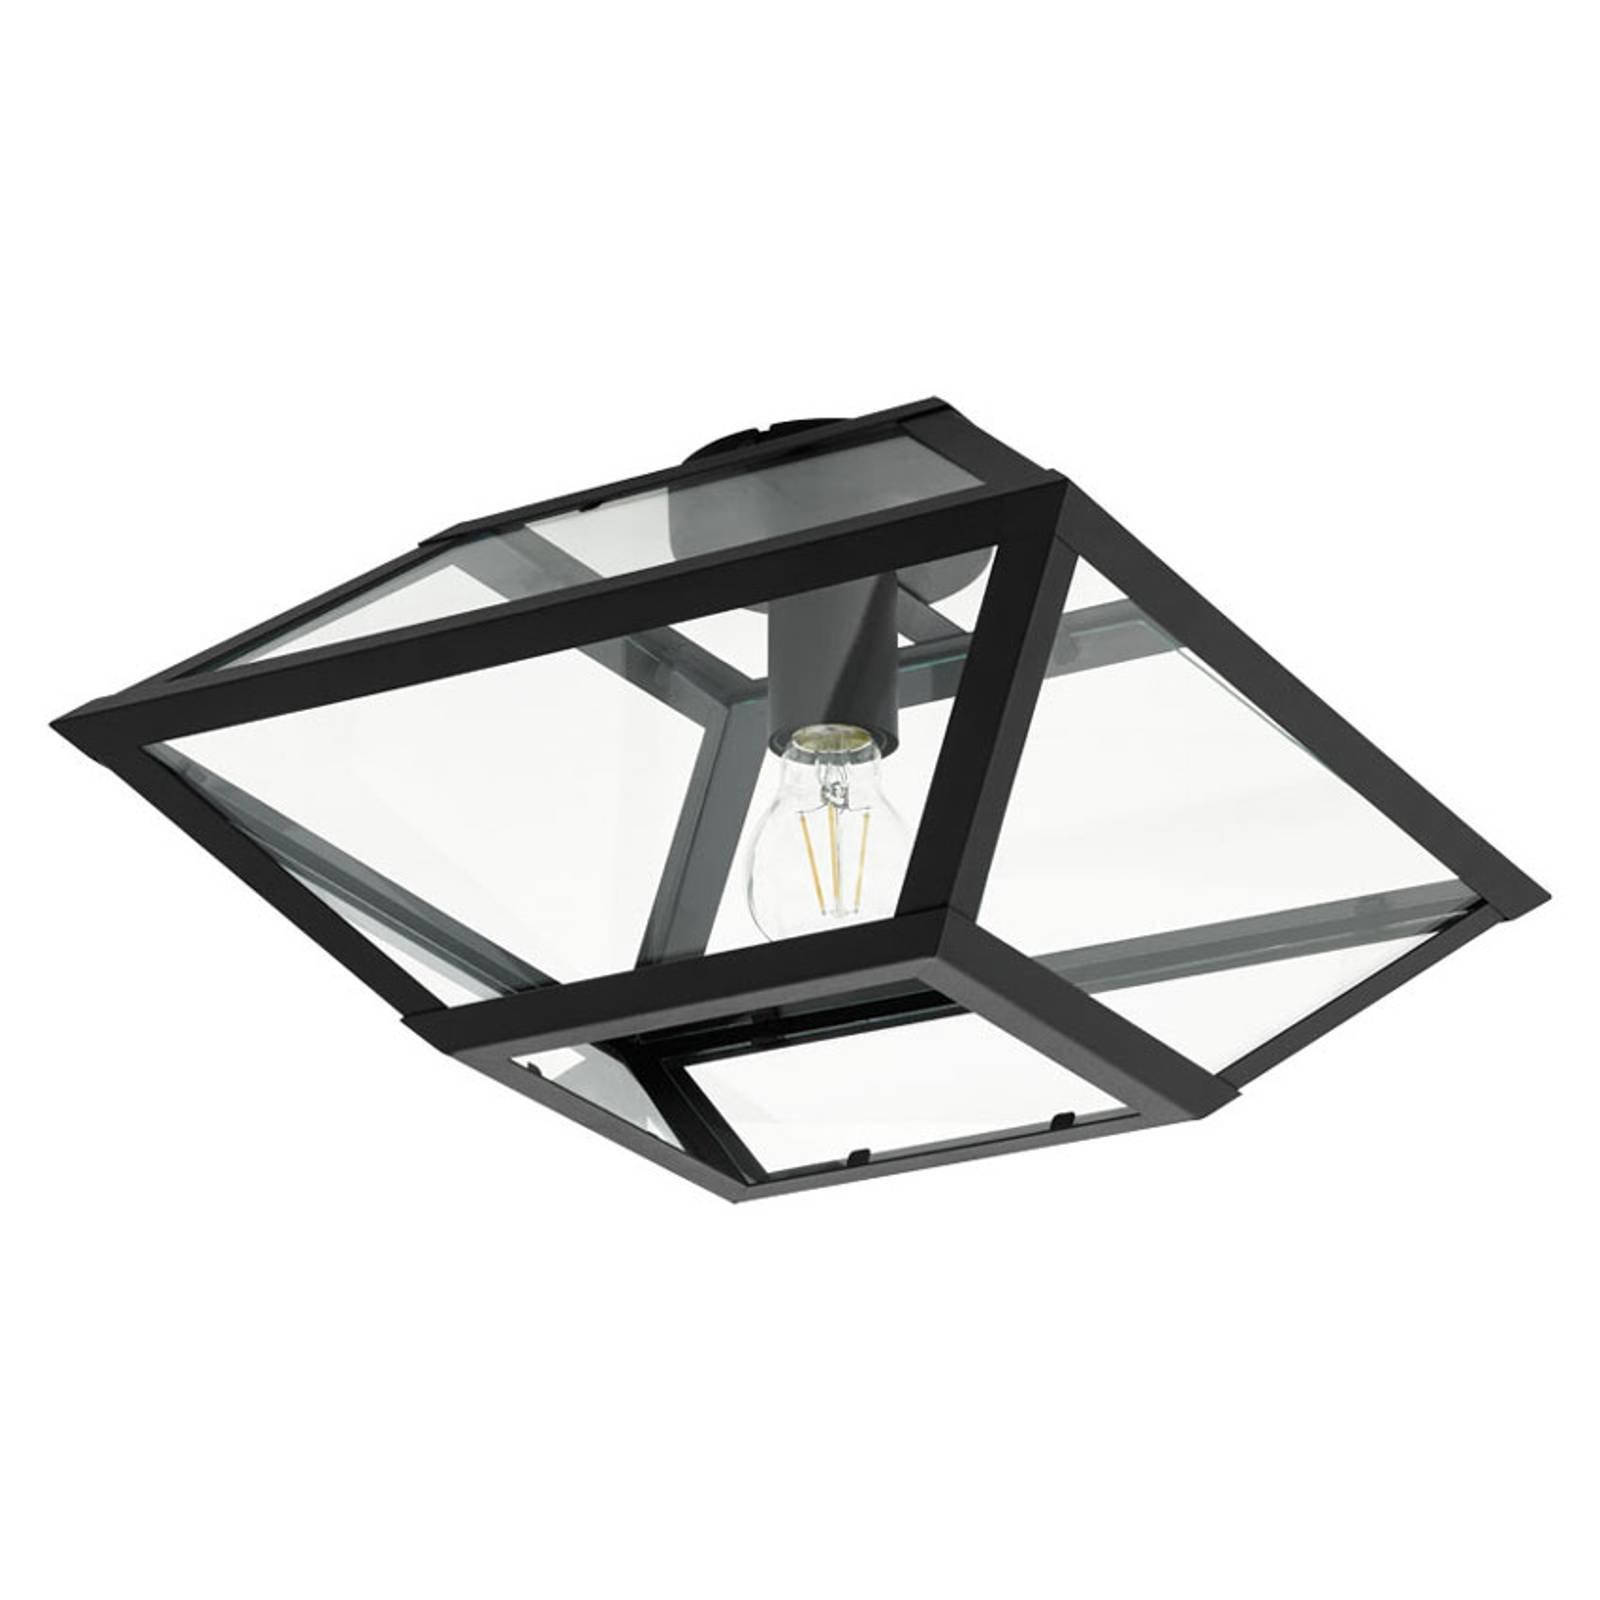 Taklampe Casefabre av stål, 37x37 cm